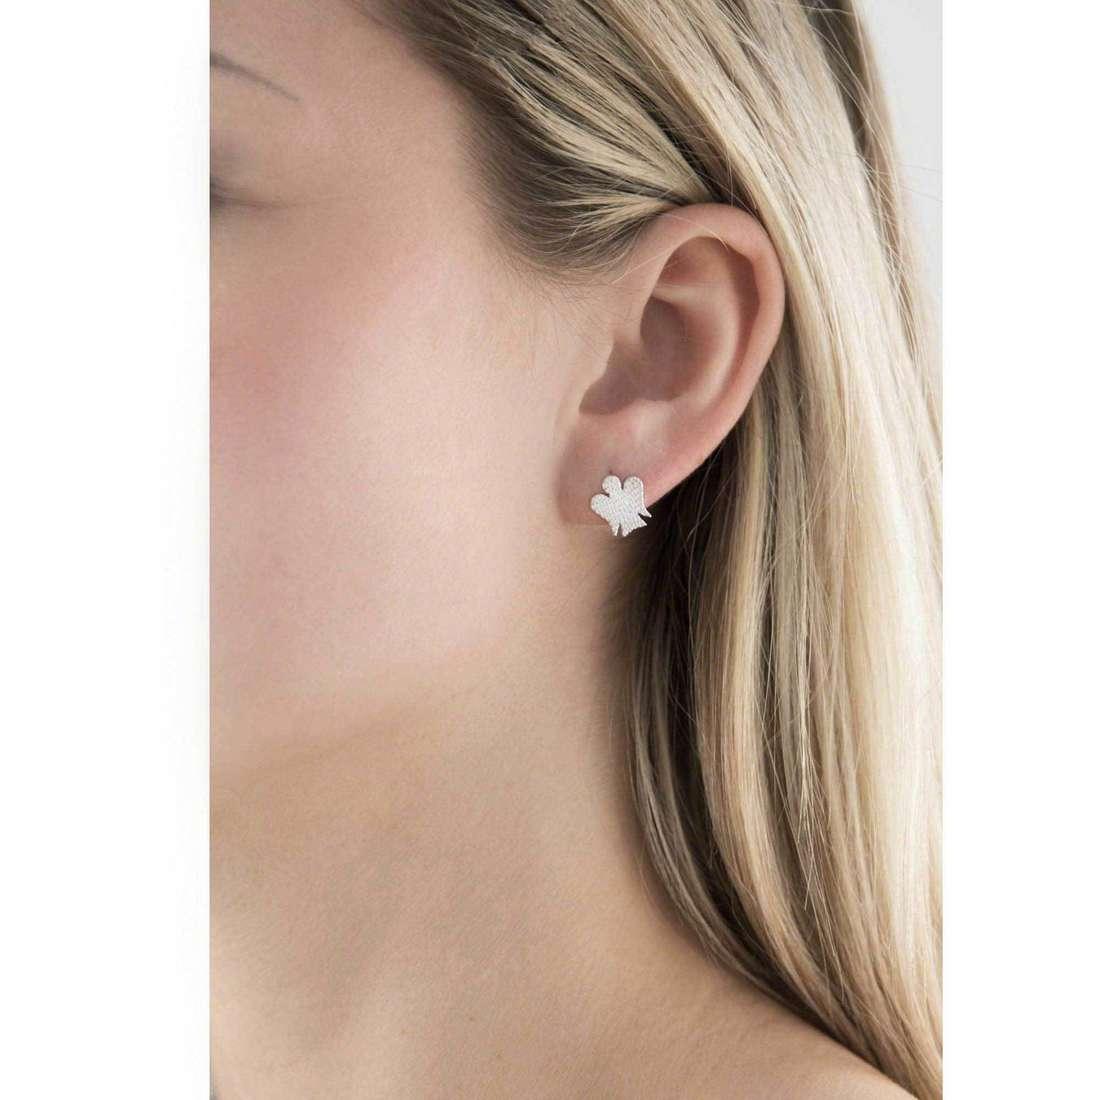 Giannotti boucles d'oreille femme GIA286 indosso